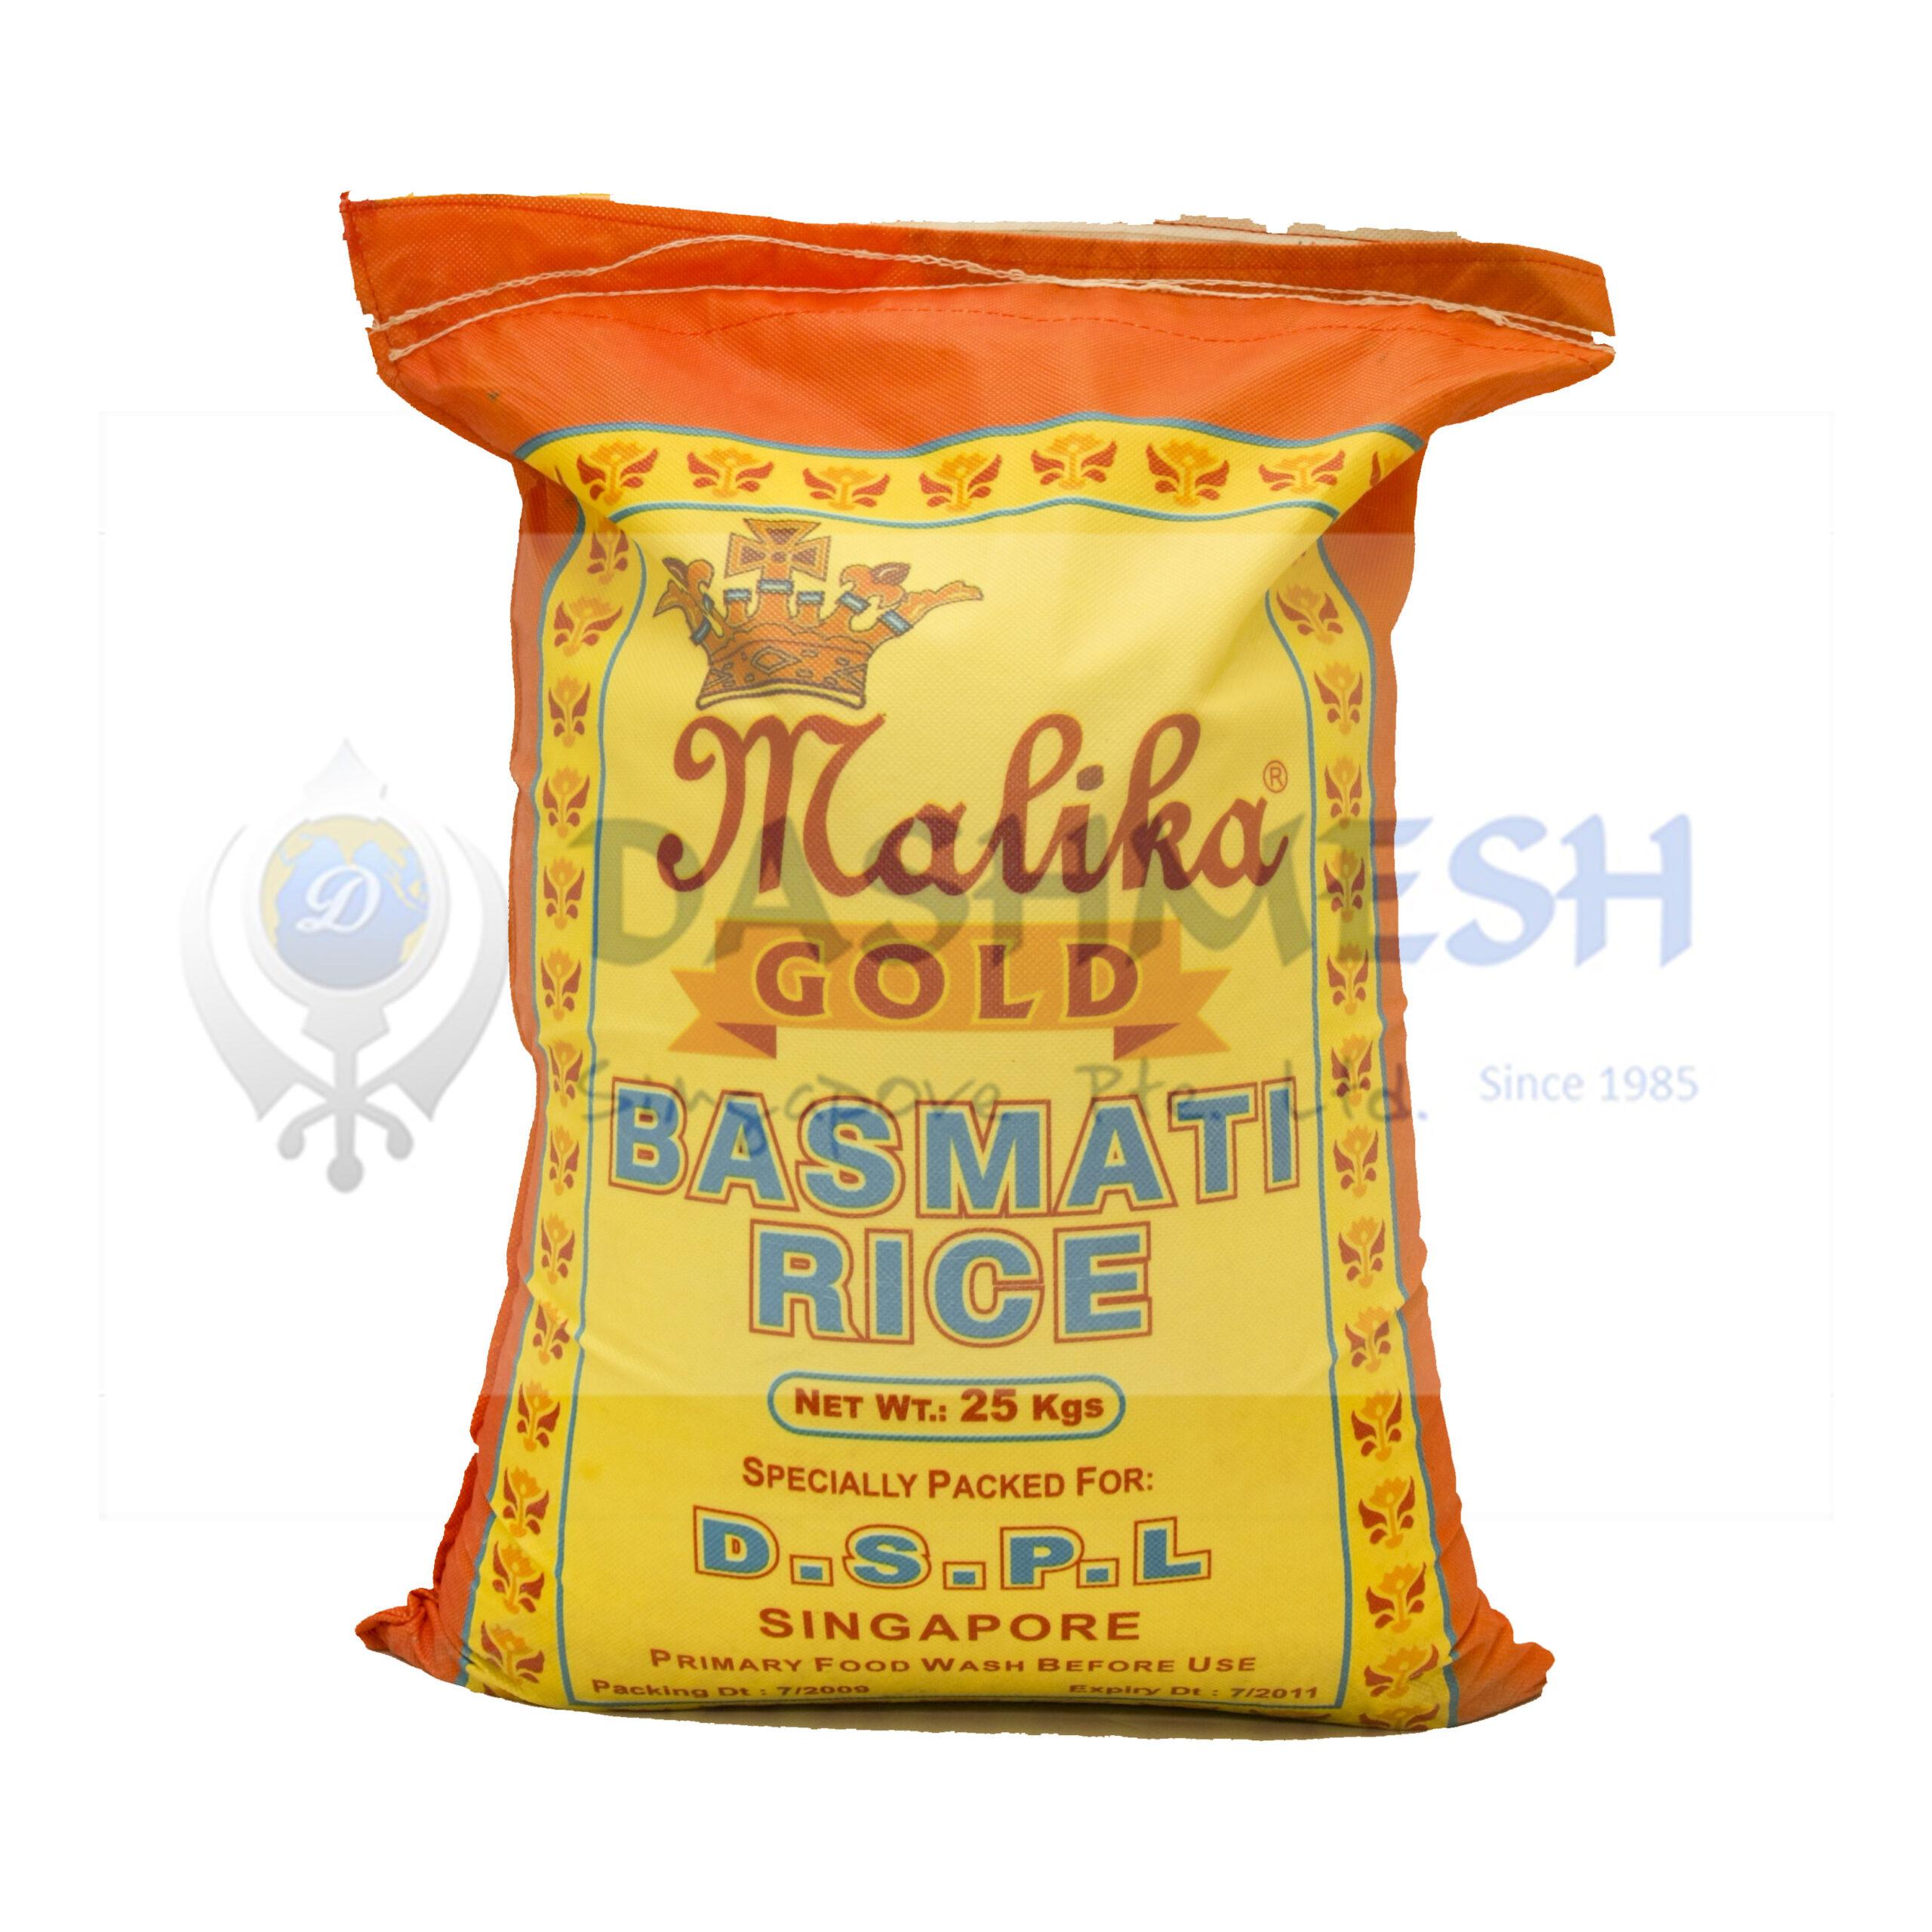 Malika Gold Basmati Rice 25Kg Bag